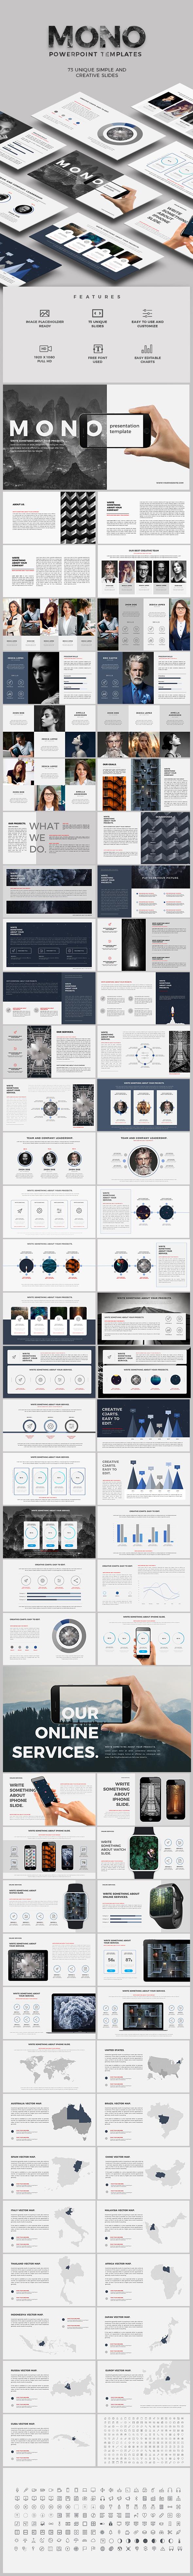 Mono Powerpoint - PowerPoint Templates Presentation Templates